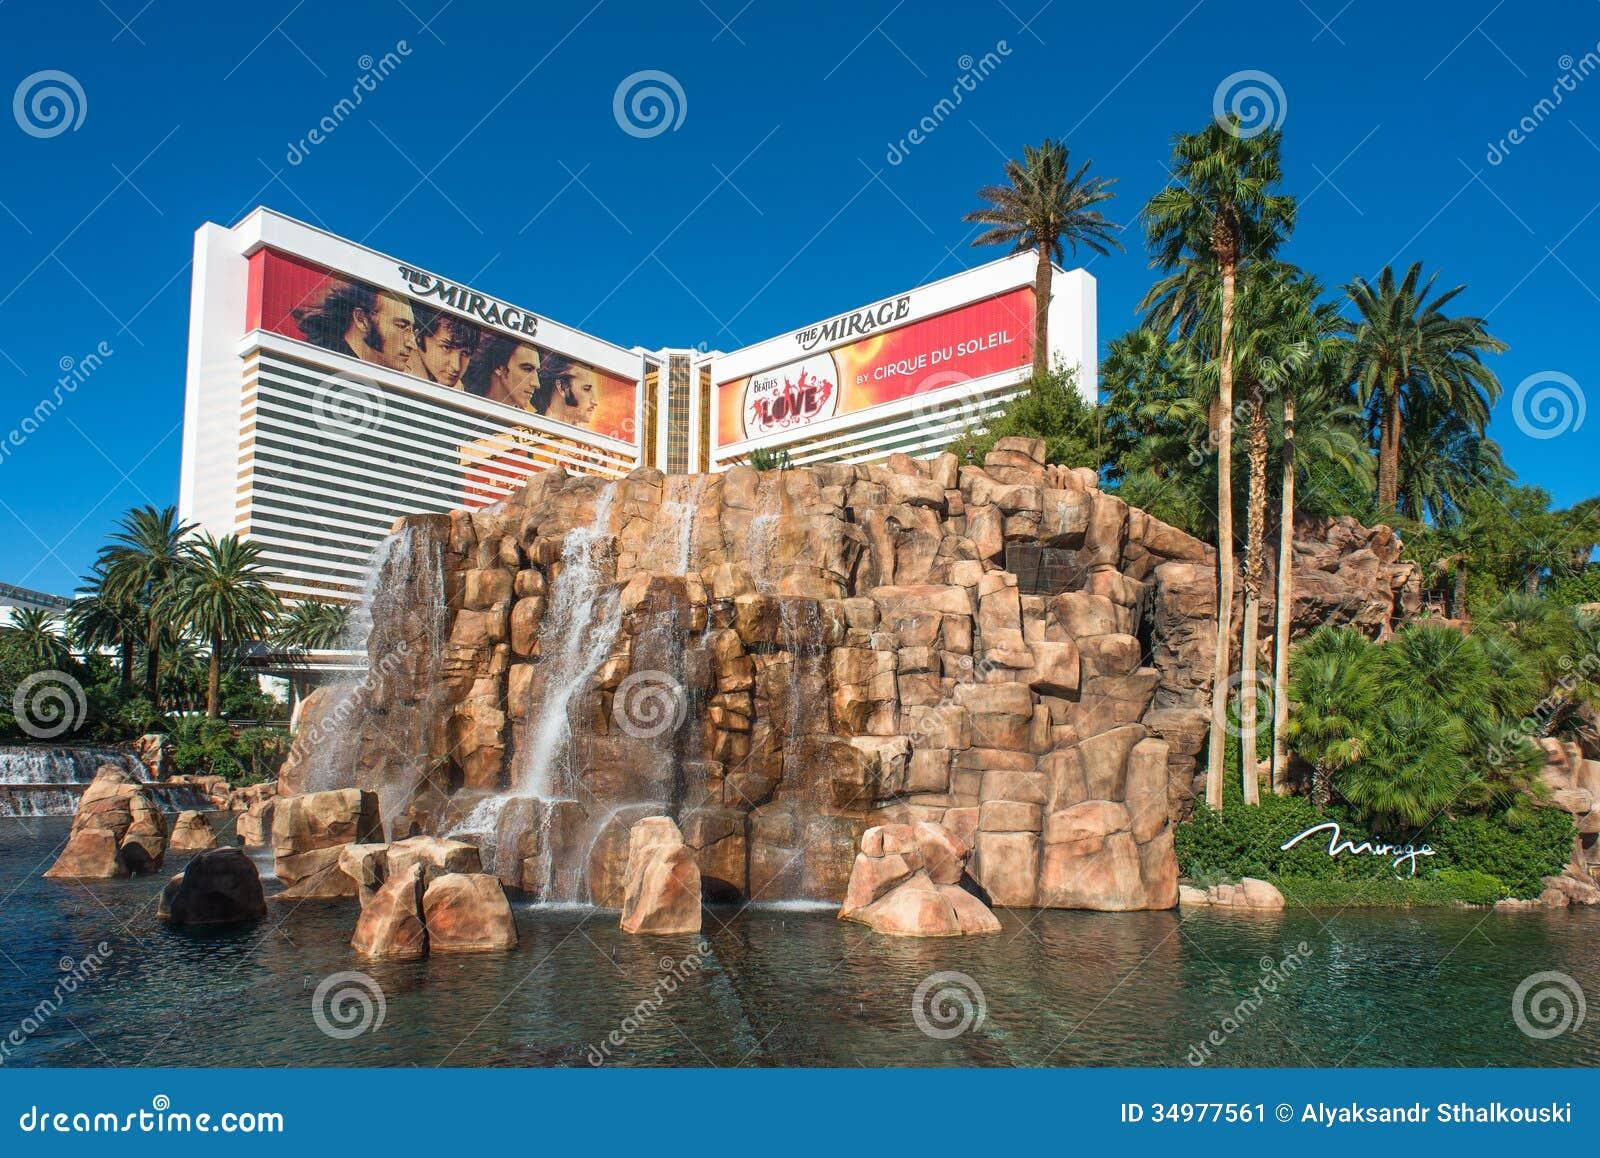 mgm resort international Mgm national harbor resort & casino, oxon hill, maryland 14k likes casino.